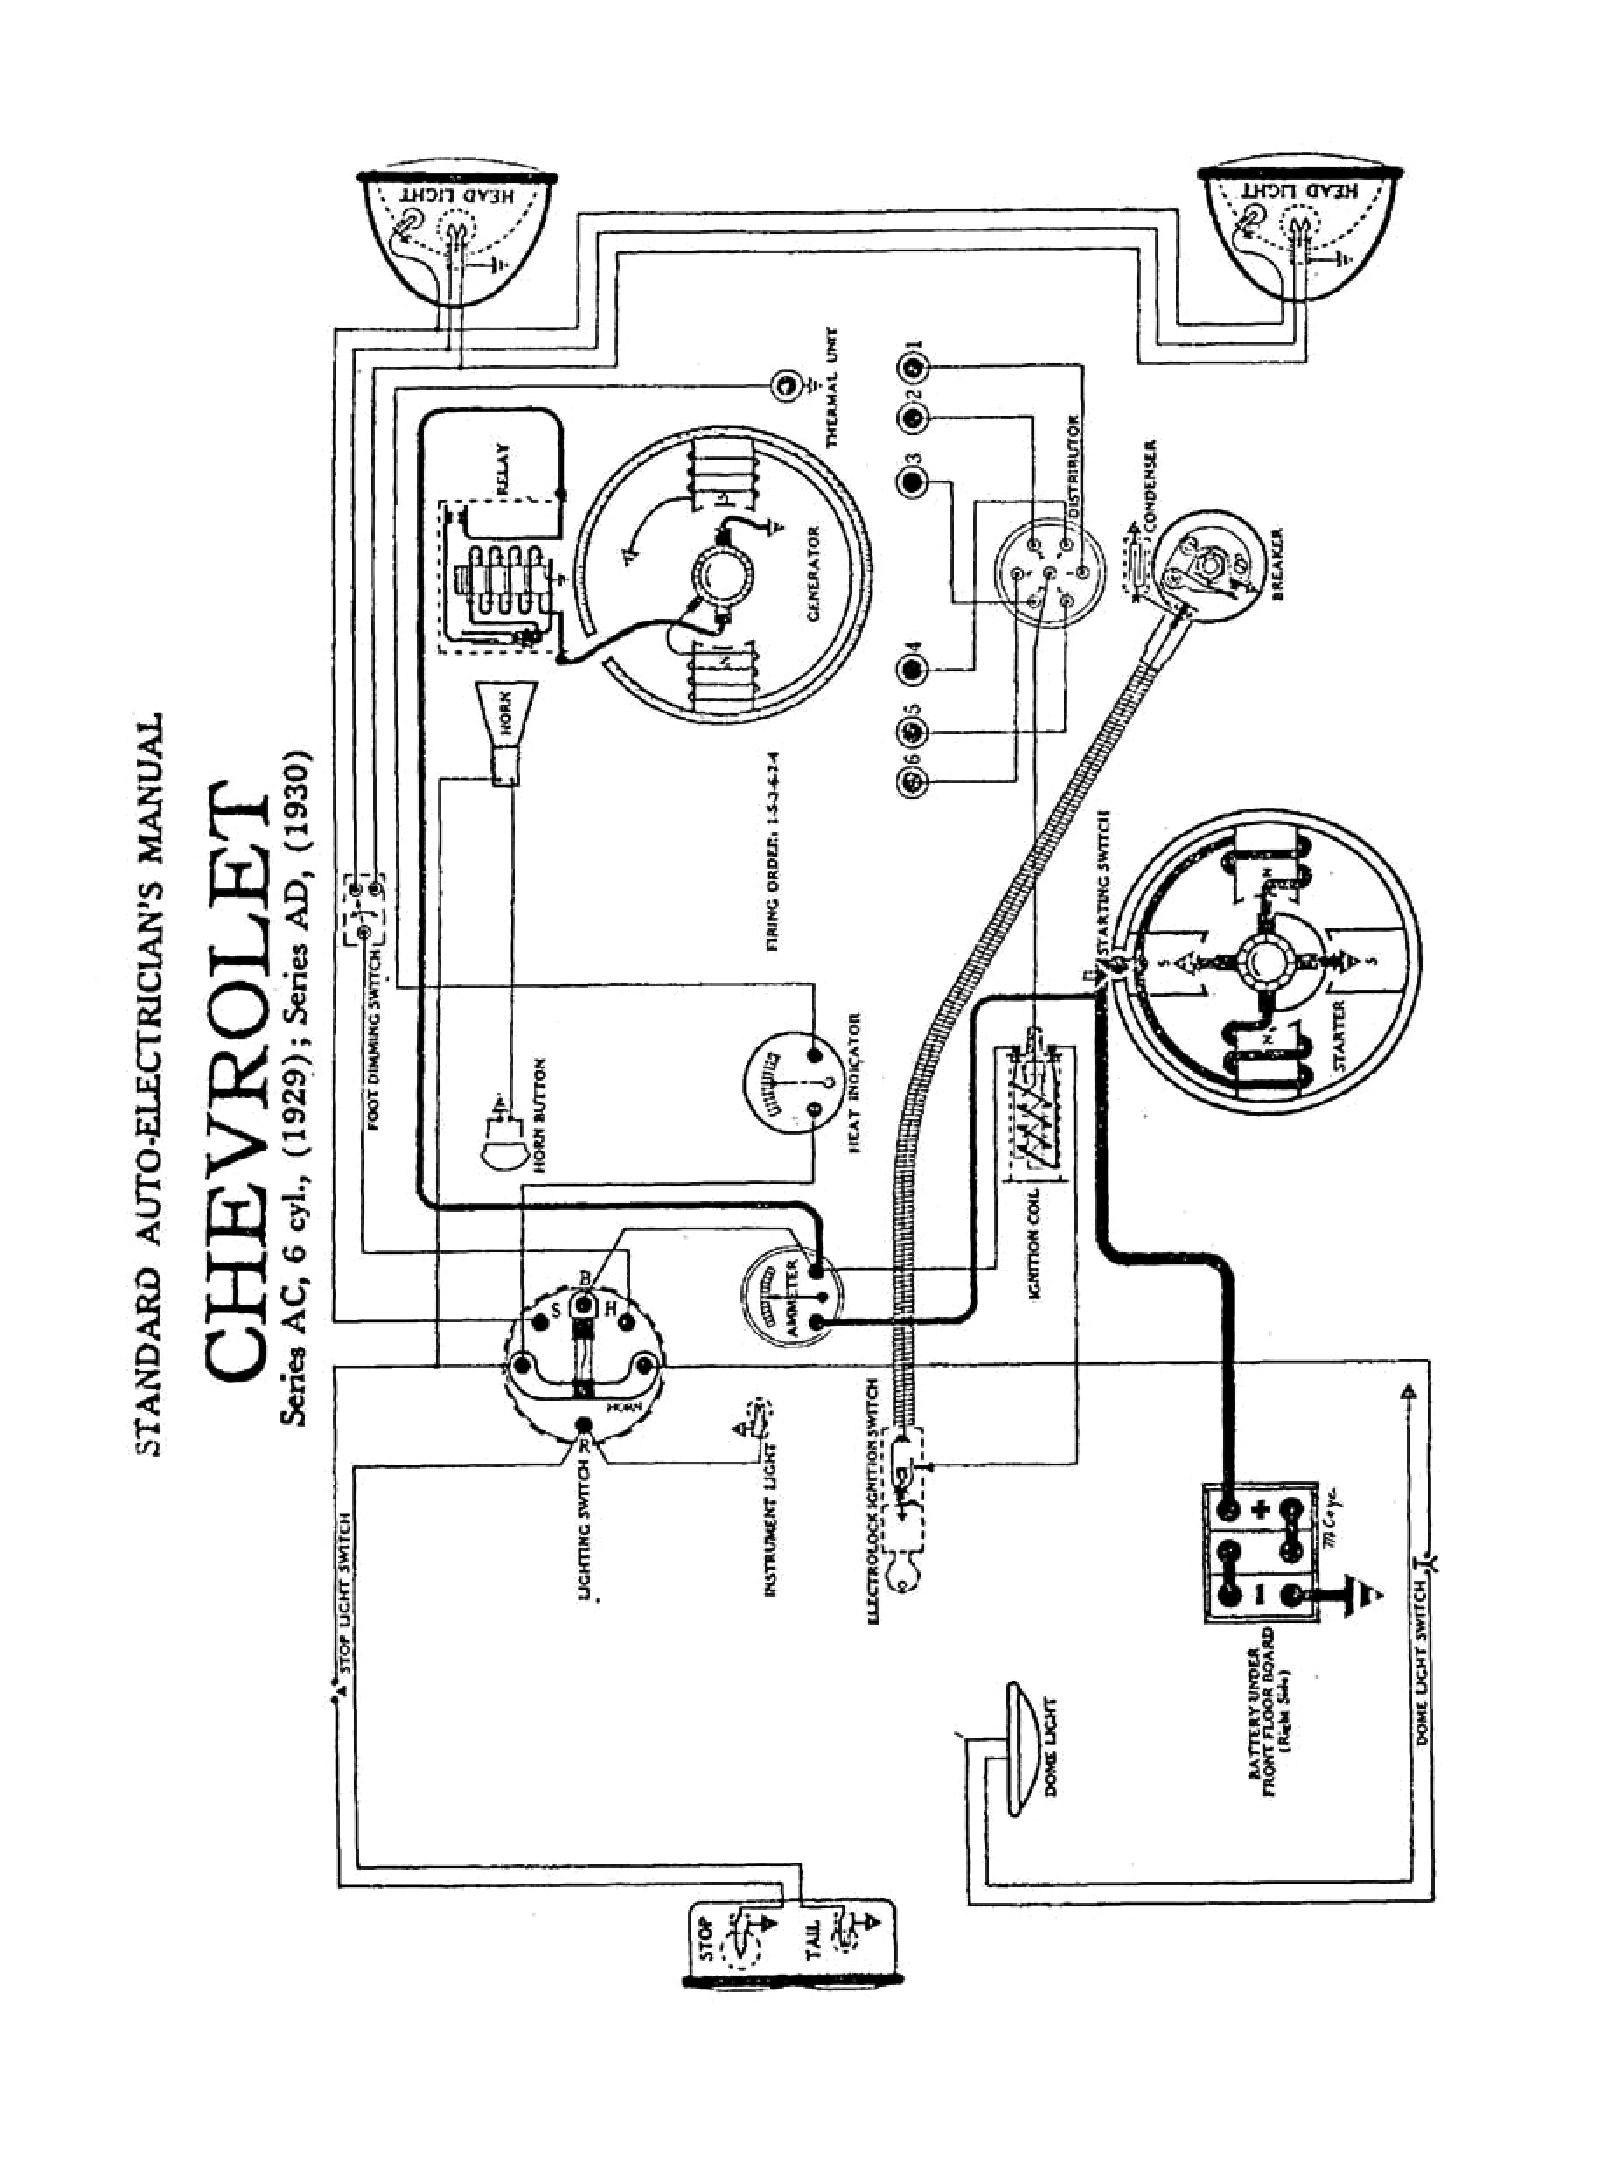 Points Distributor Wiring Diagram General Motors | Wiring Diagram - General Motors Wiring Diagram